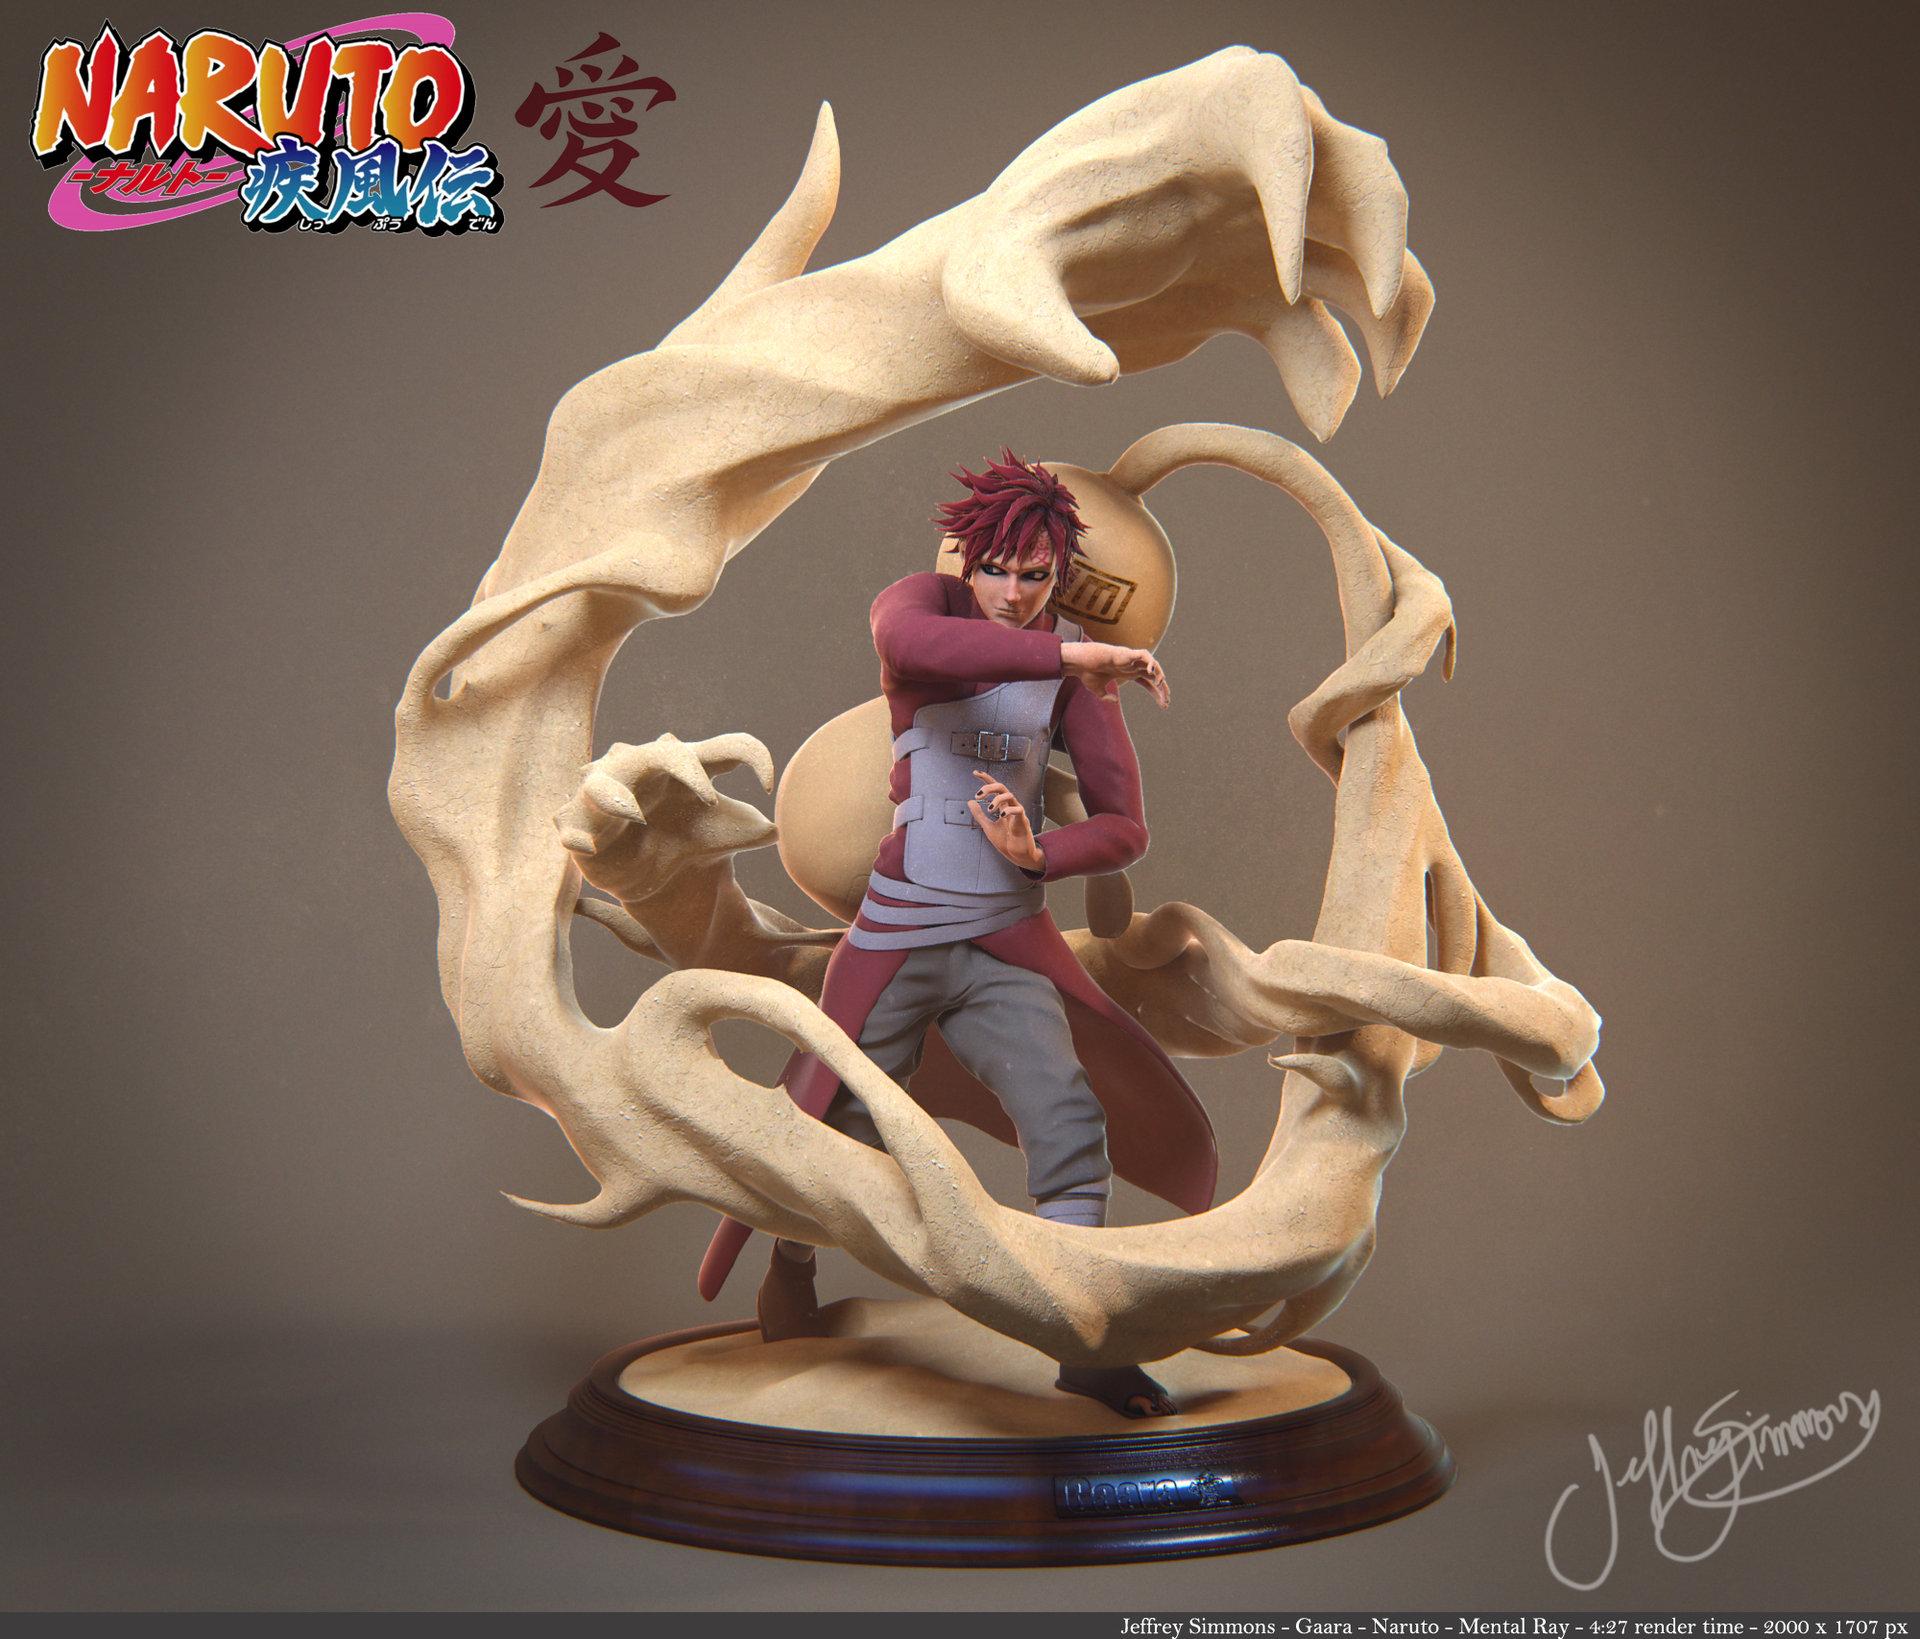 Akatsuki Hd Live Wallpaper Artstation Gaara Fanart Naruto Jeff Simmons